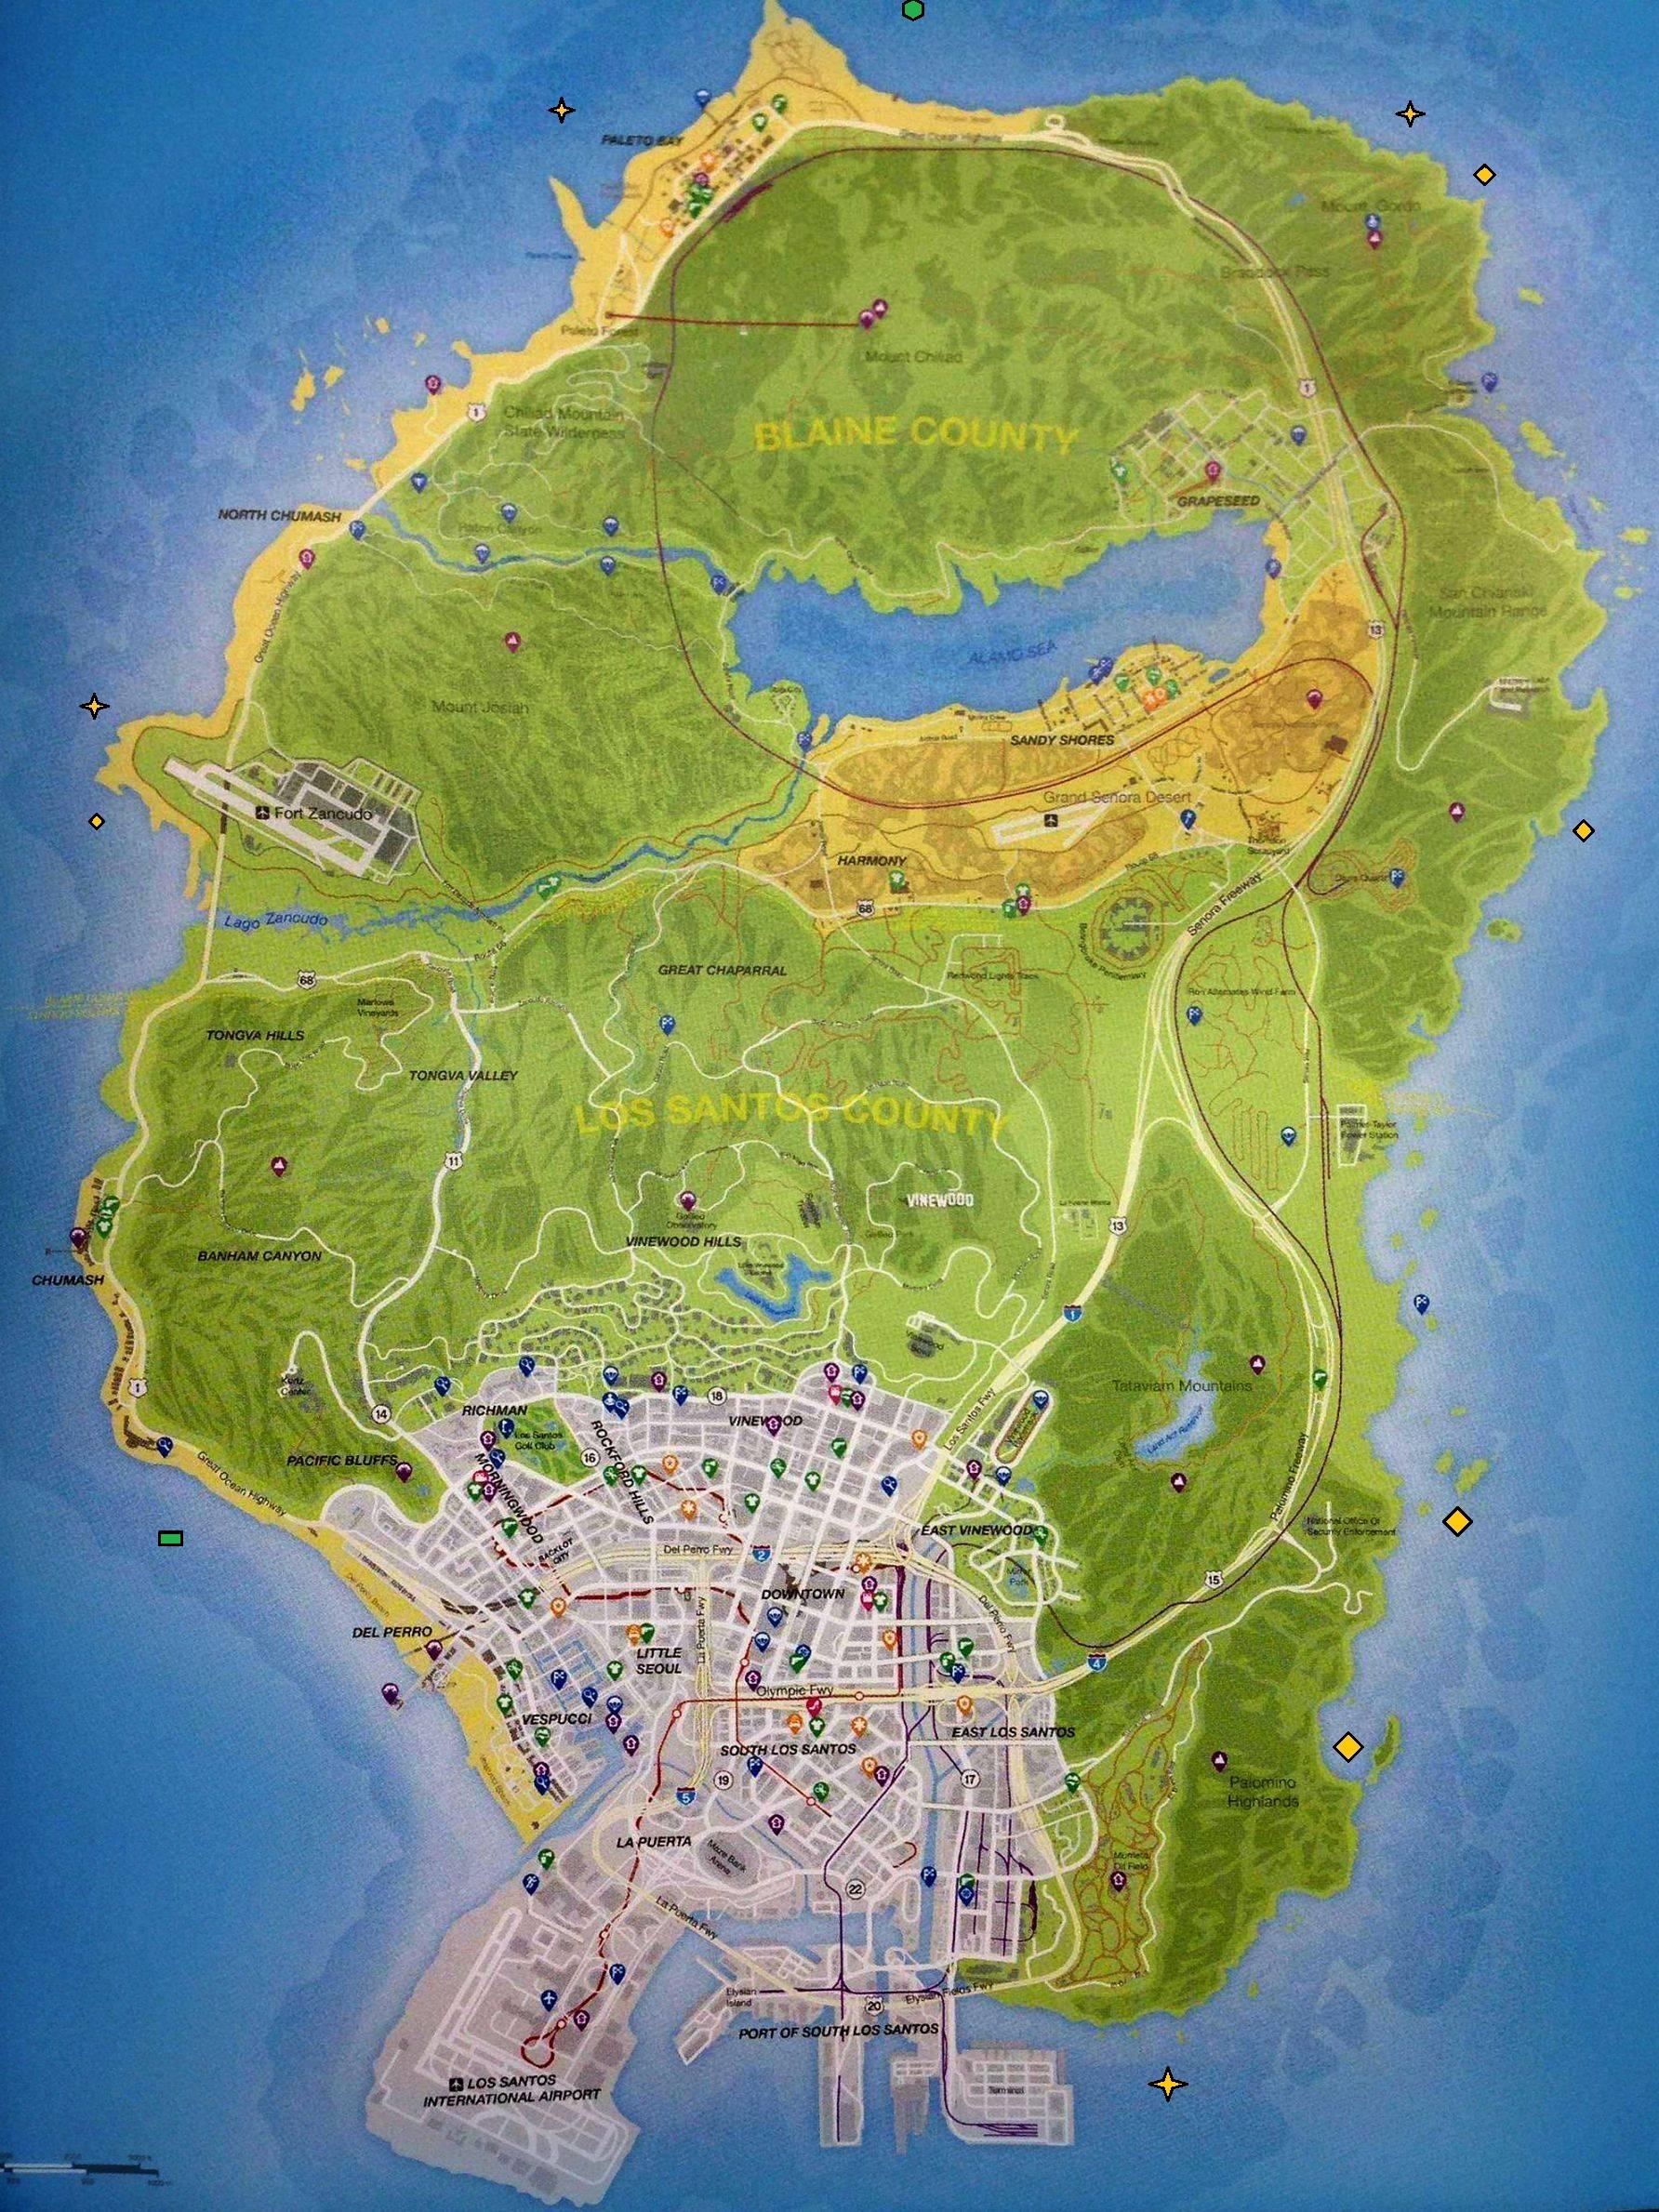 Image cj gtav transparent png gta wiki the grand theft auto wiki - Grand Theft Auto V